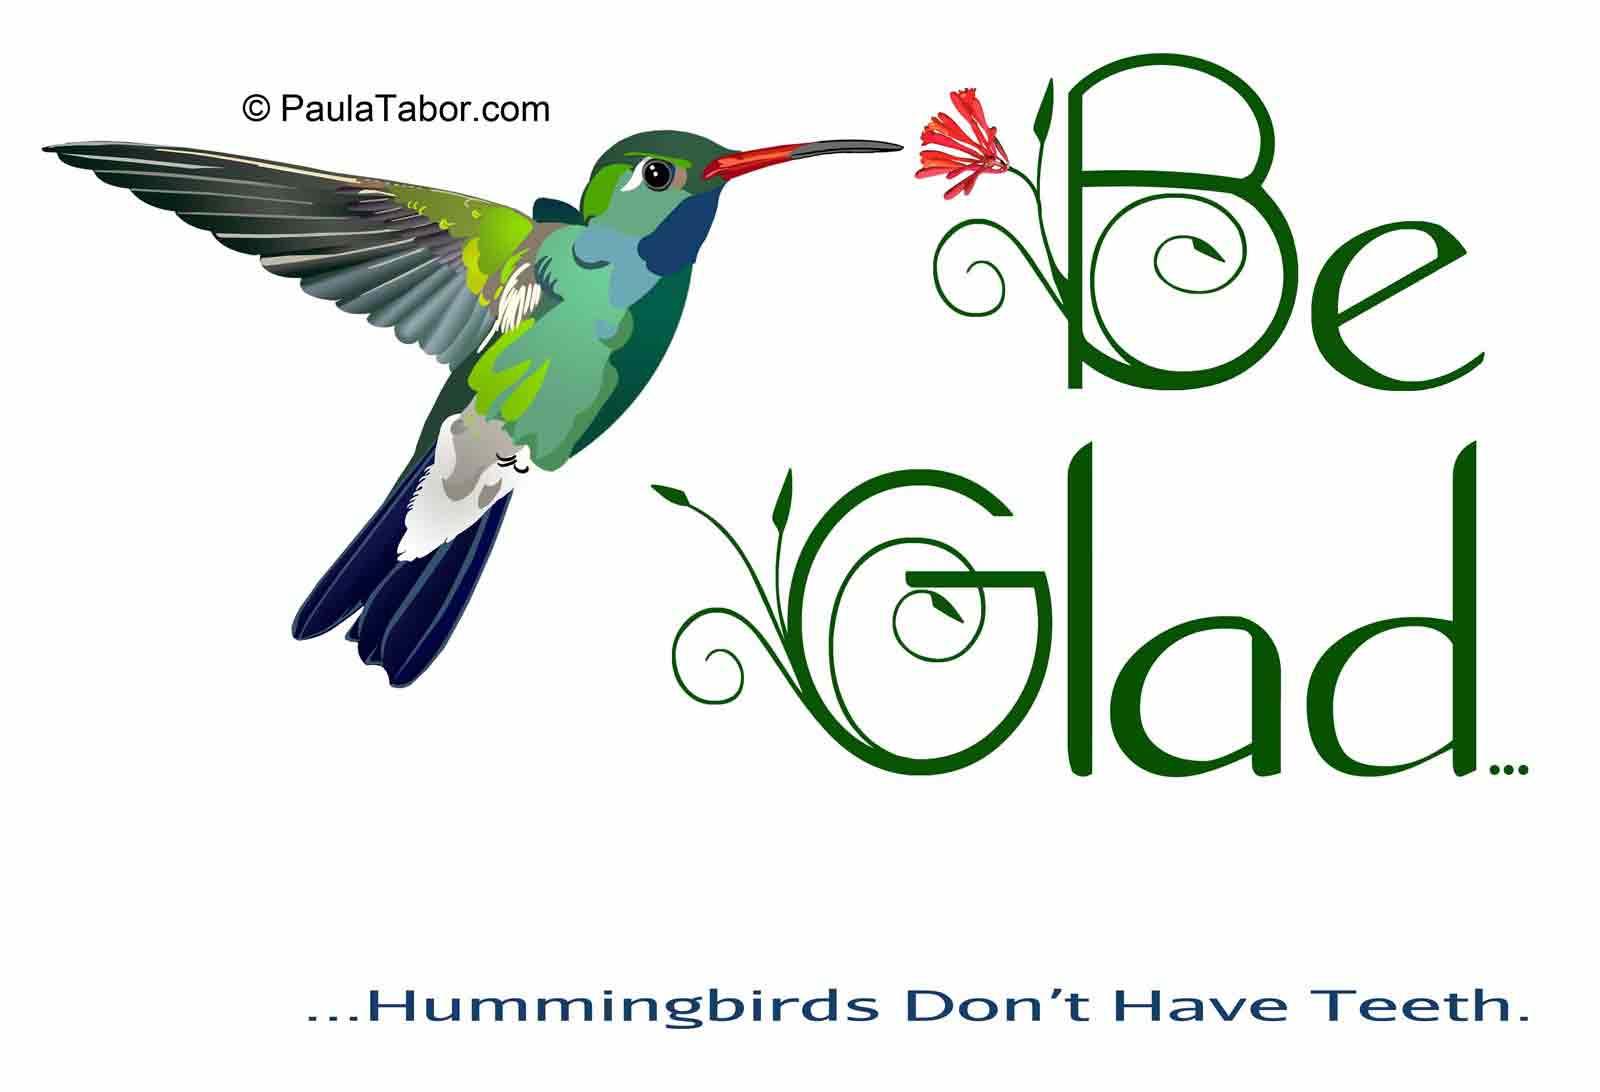 Paula Tabor: Humorous Pet and Gardening Cartoons